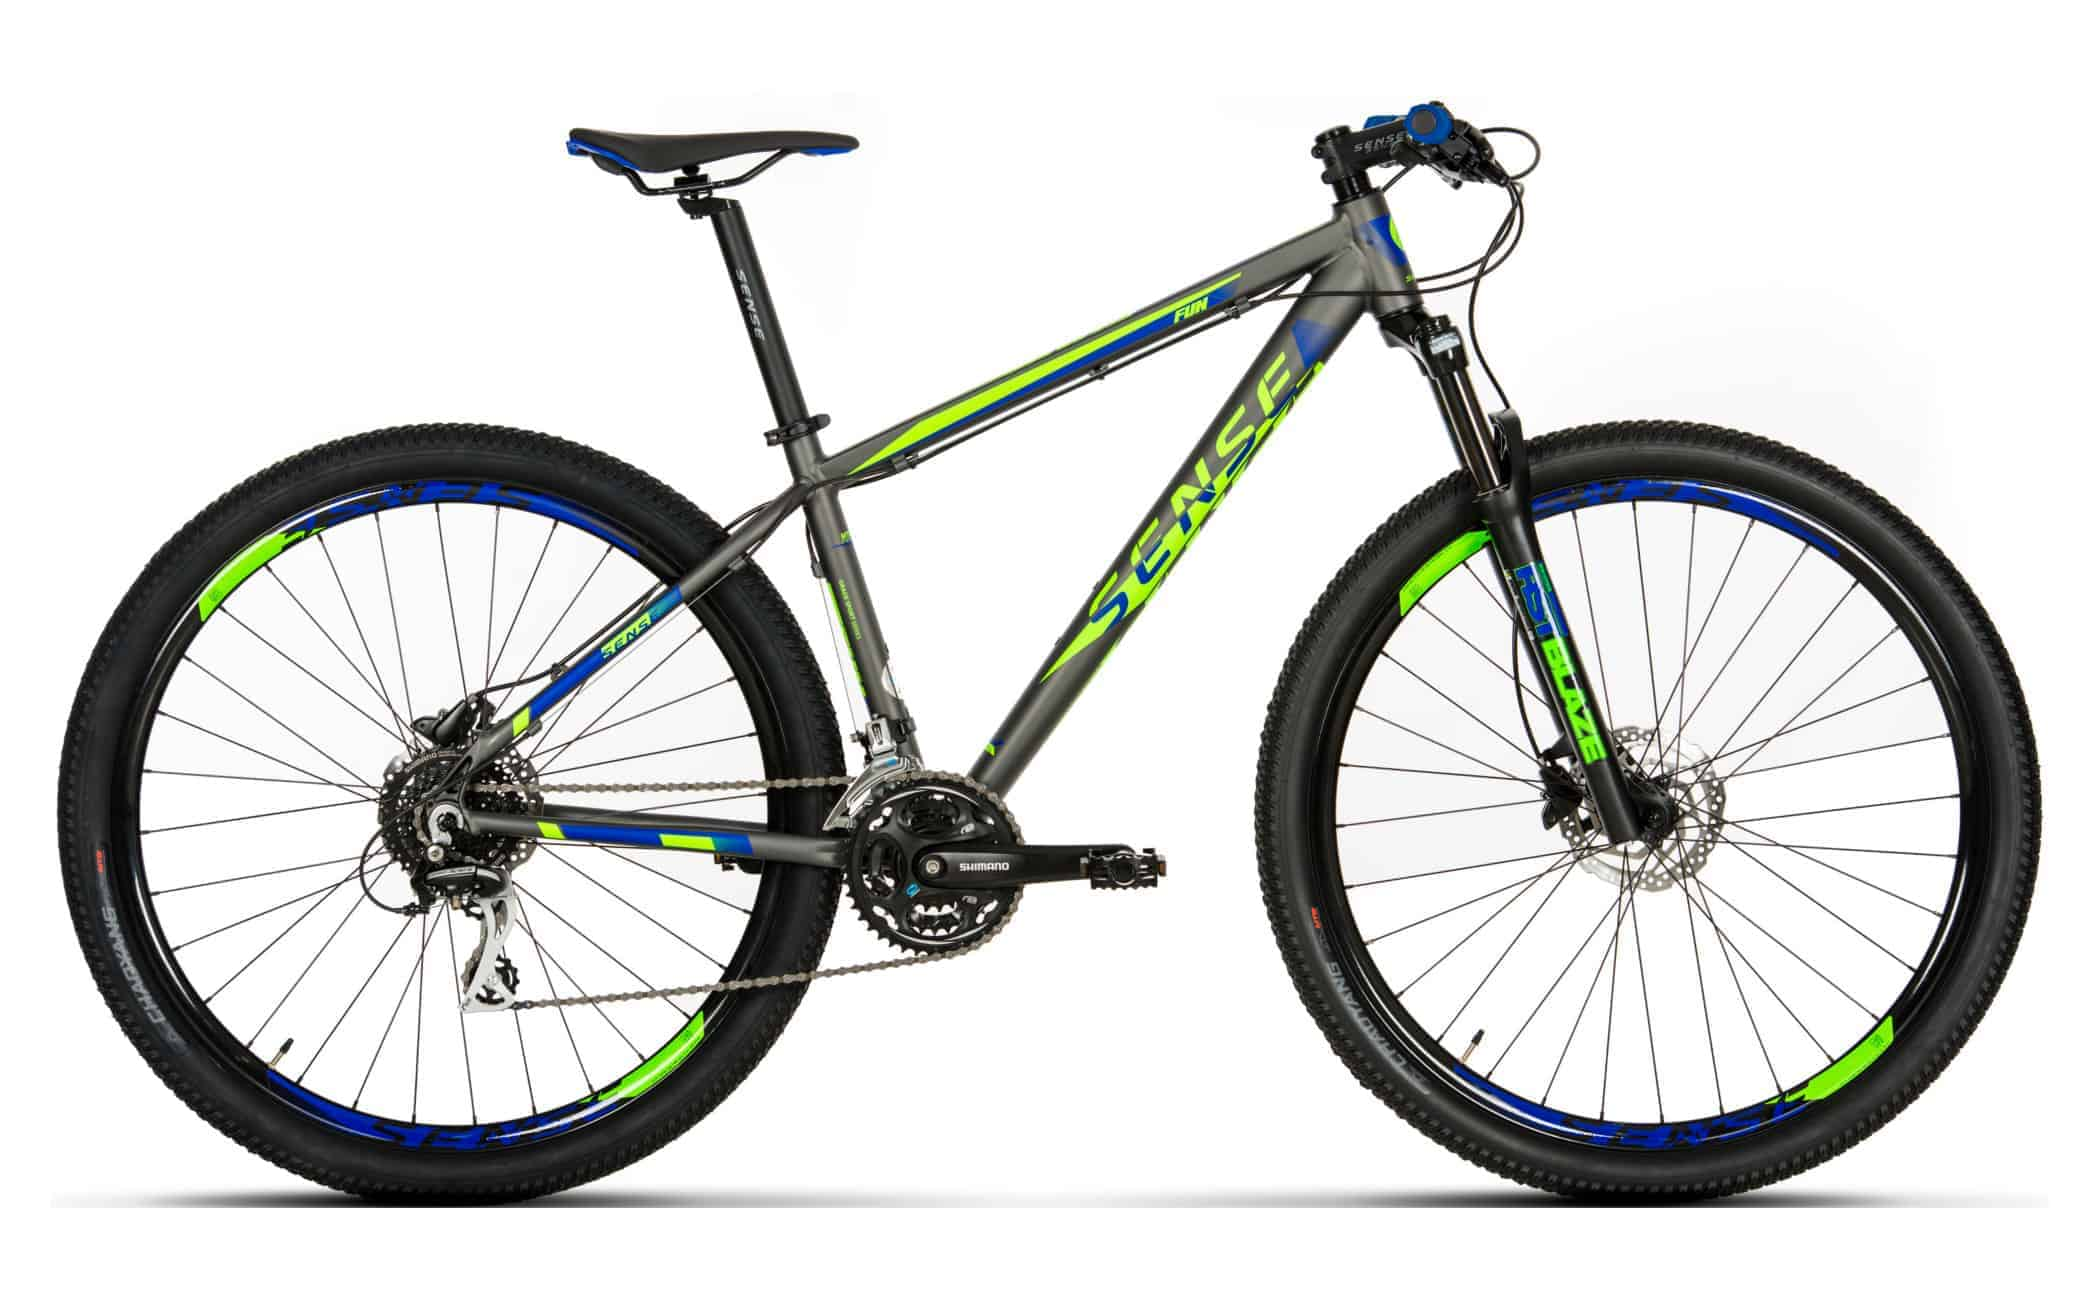 03a8f8259 Bicicleta MTB Sense Fun 2019 verde azul